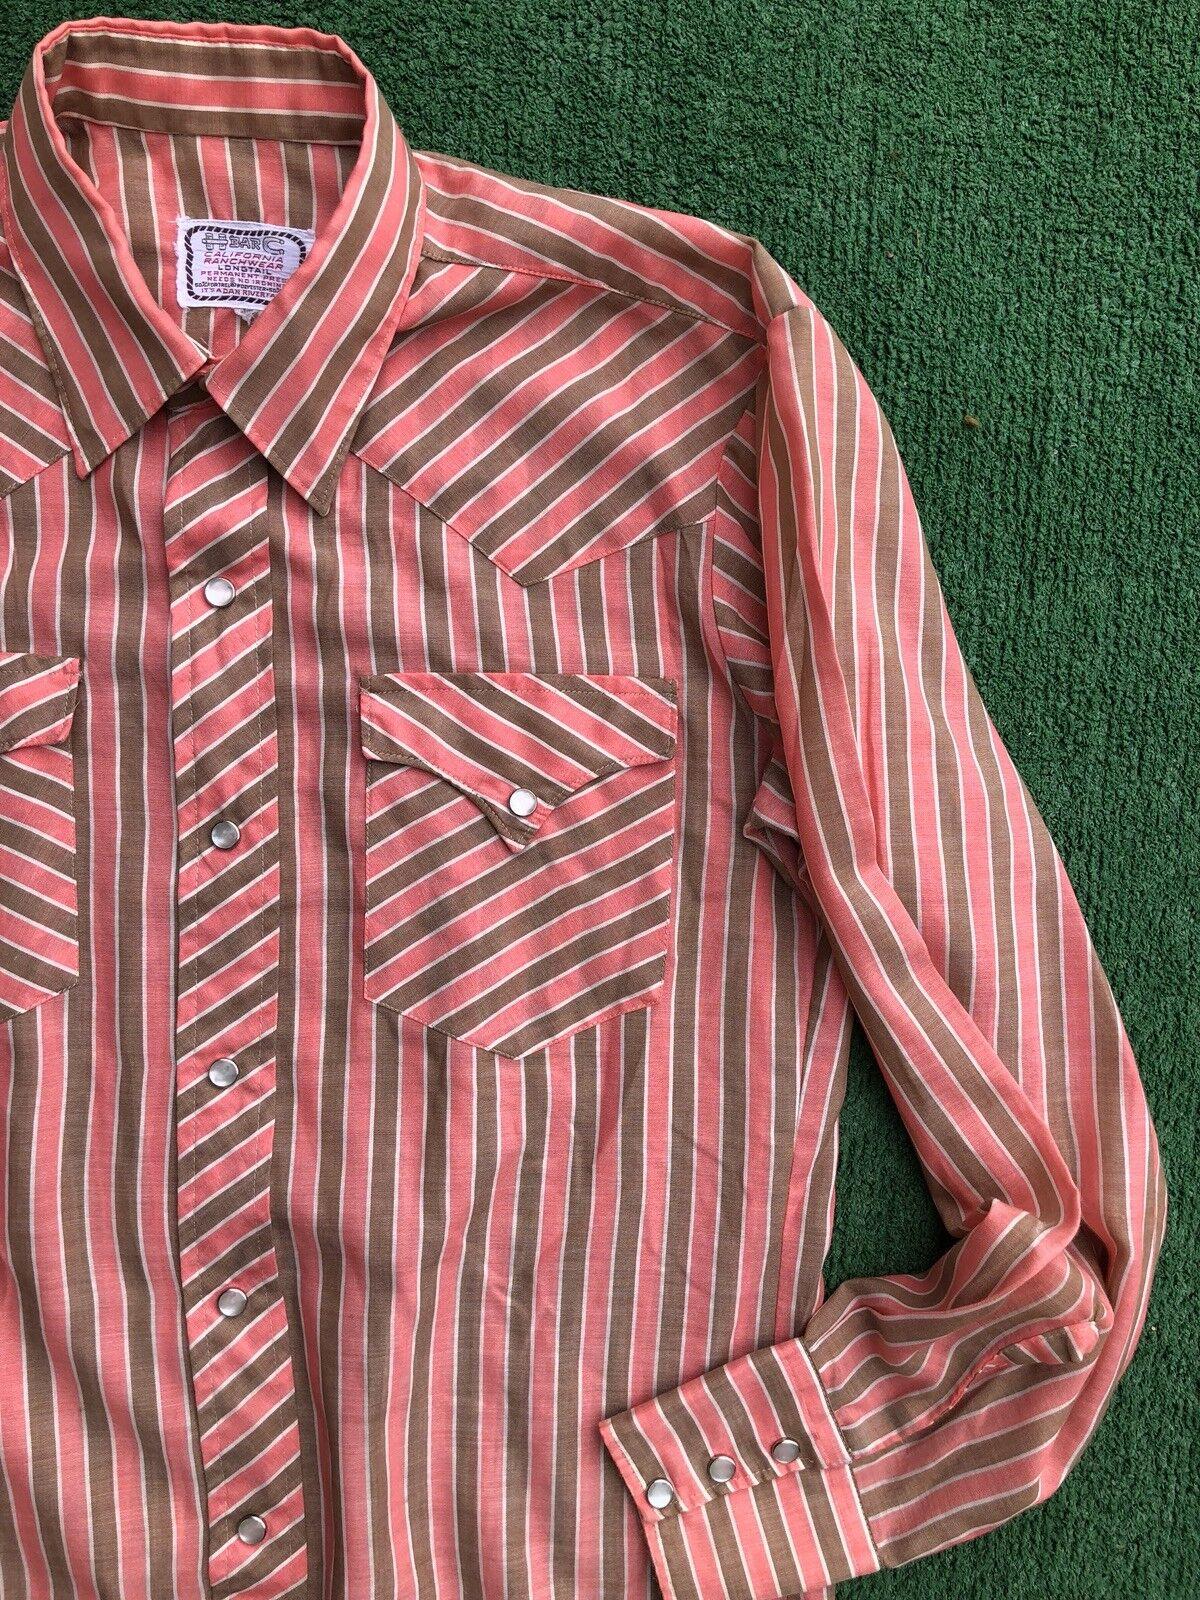 9bea8422064 VTG Men's H BAR C Long Pearl Snap Pink Brown Stripe Western Shirt ...